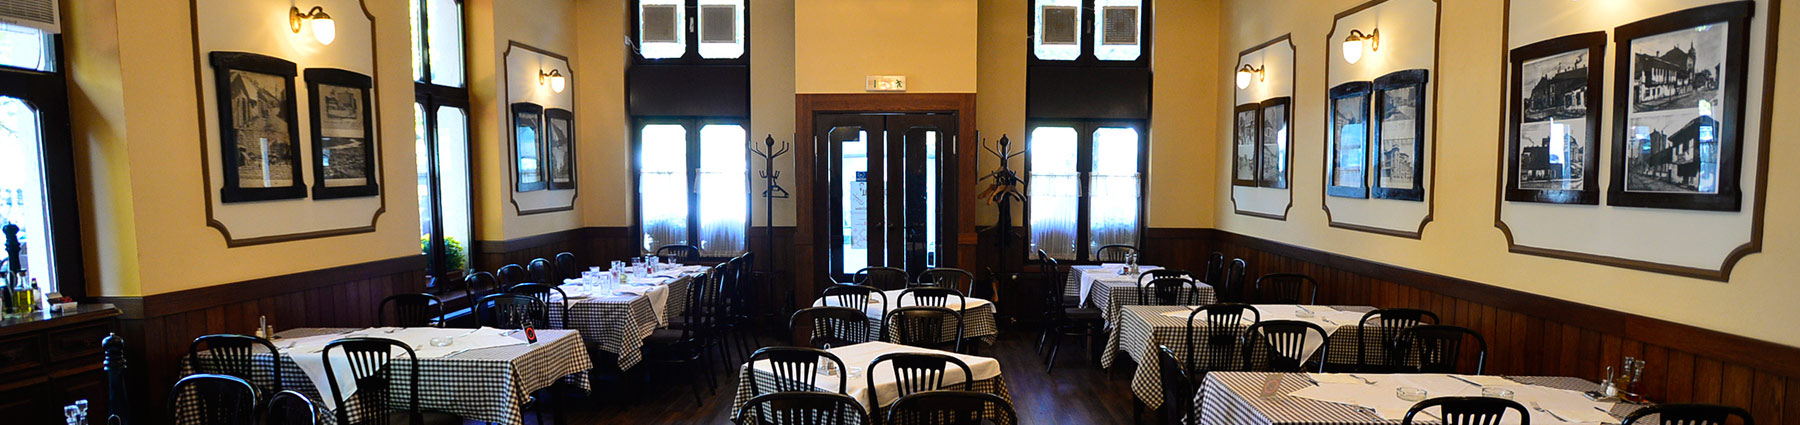 Restaurant Orasac